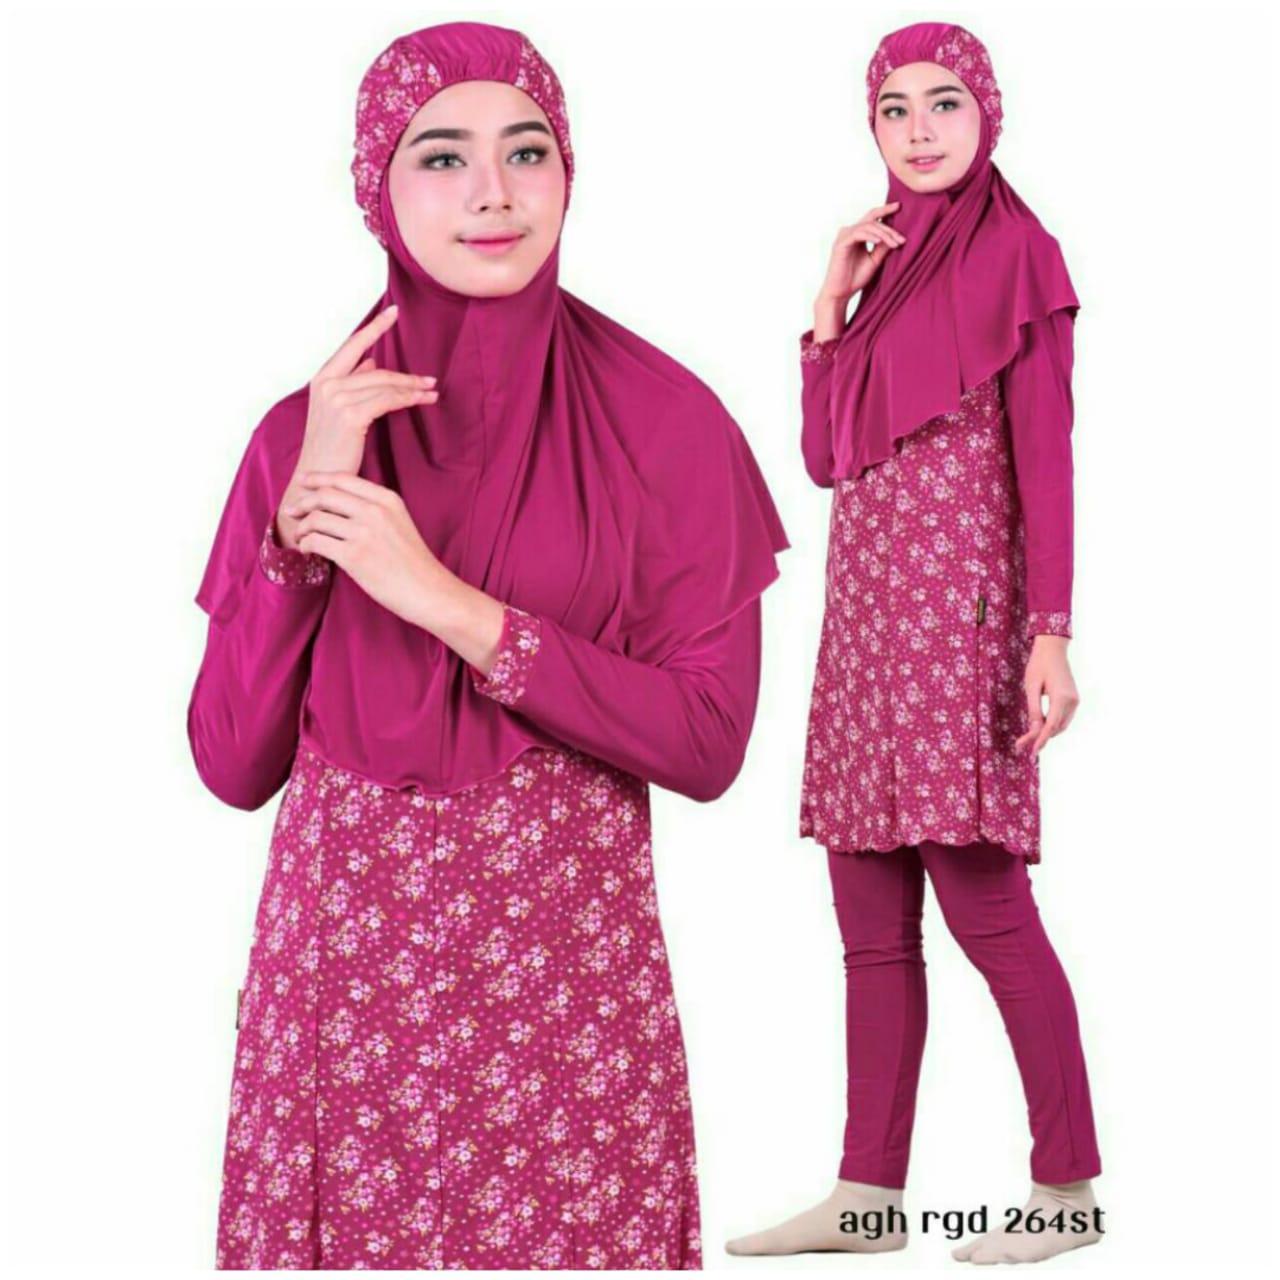 Aghnisan Baju Renang Muslimah - Pink Fanta